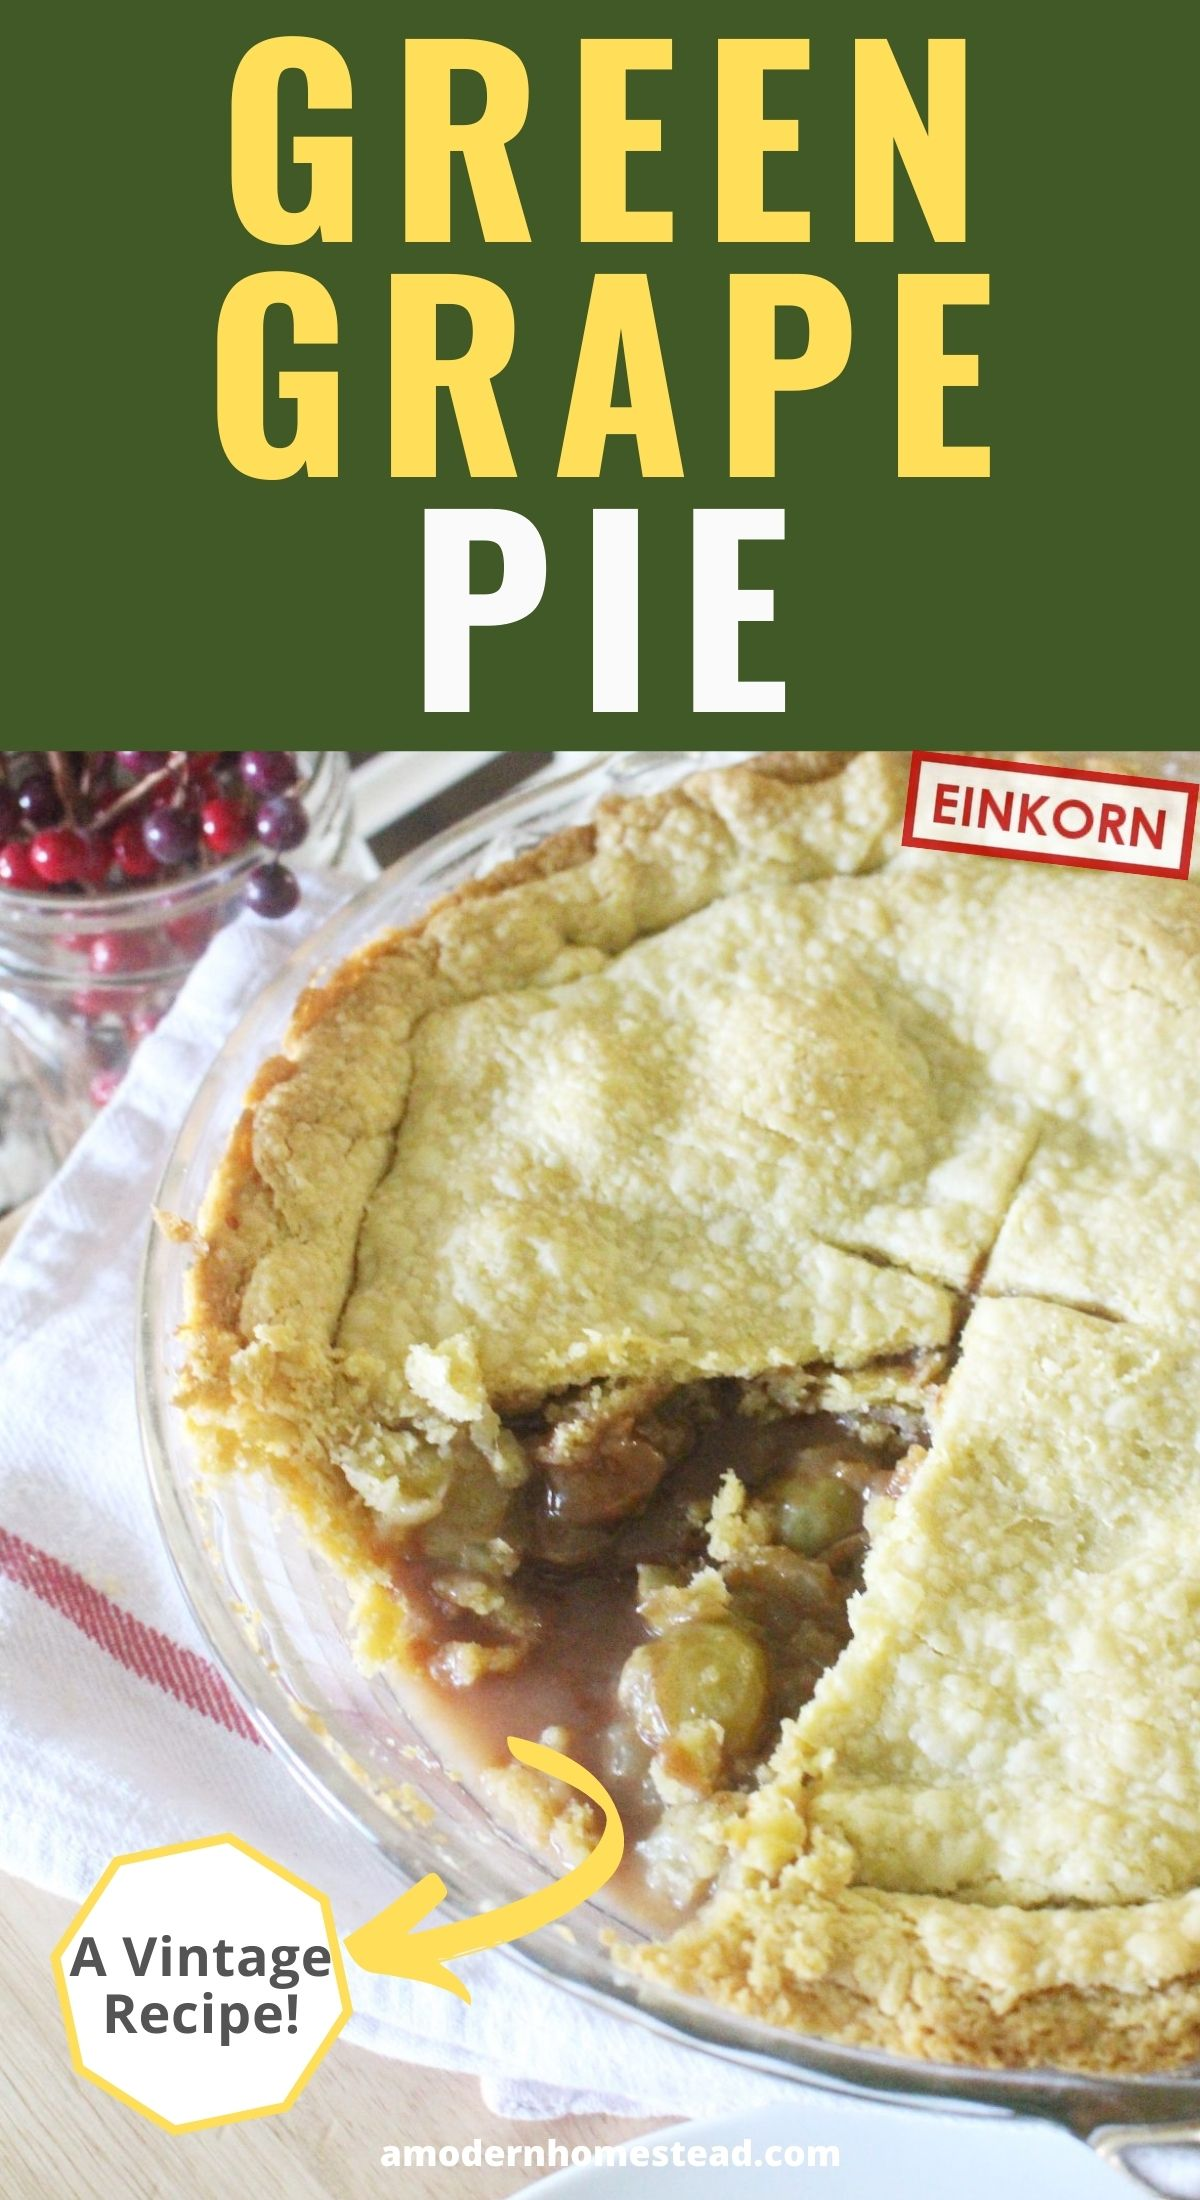 einkorn pie crust and green grape pie in a glass pie pan